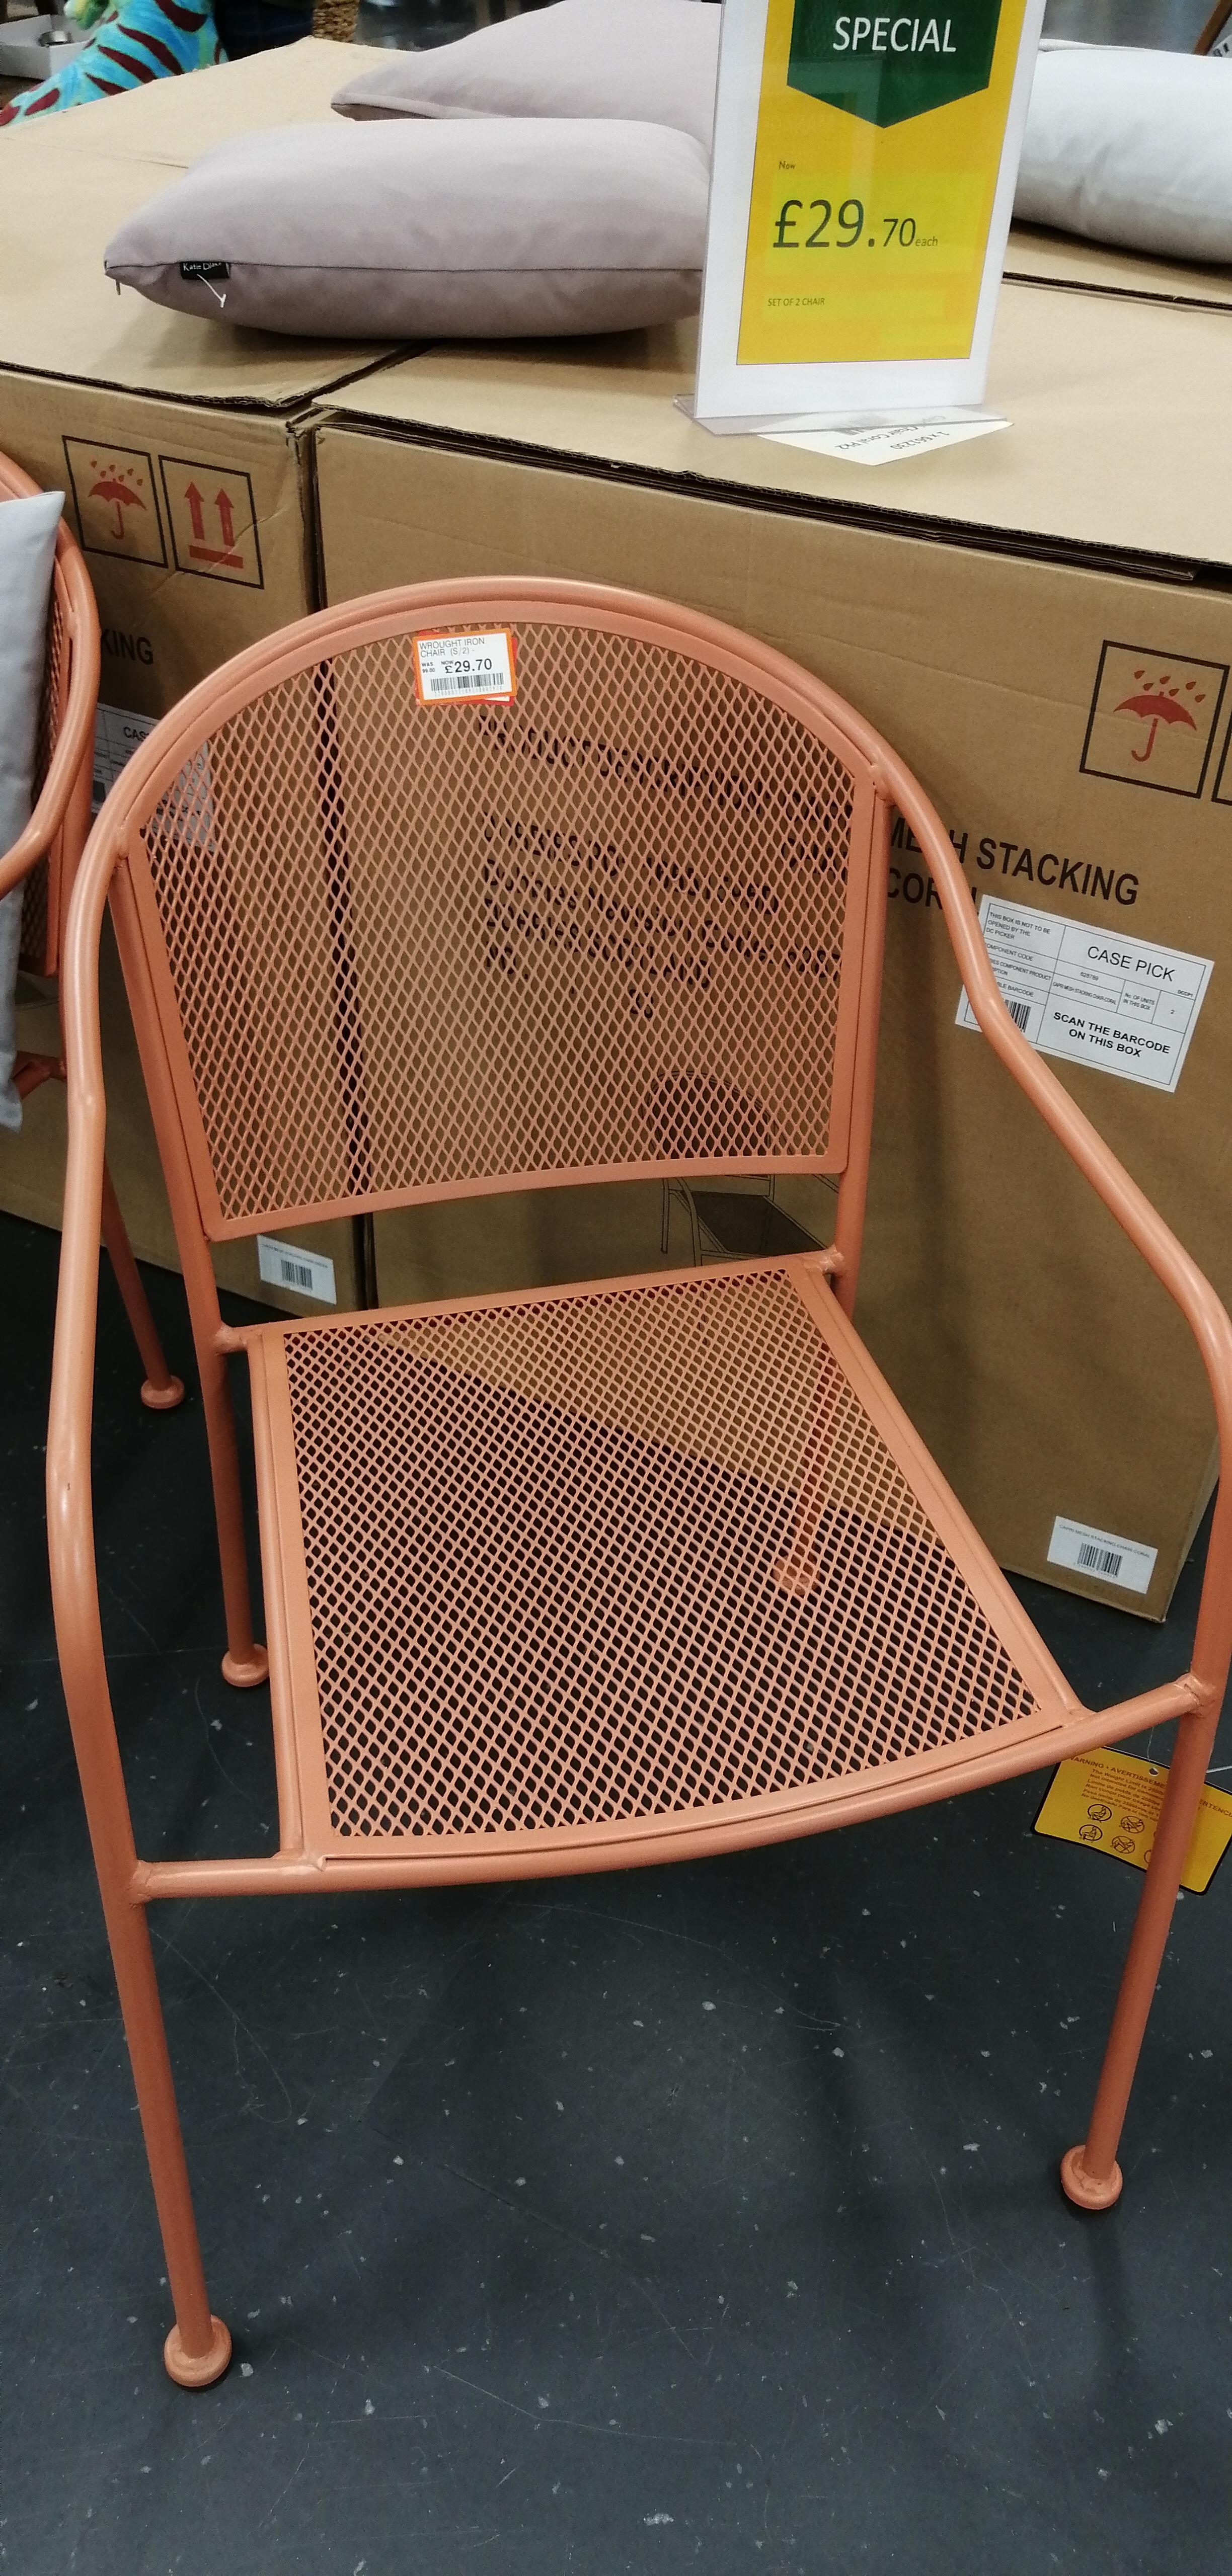 2 wrought iron garden chairs £29 @ Dobbies garden centre Nuneaton